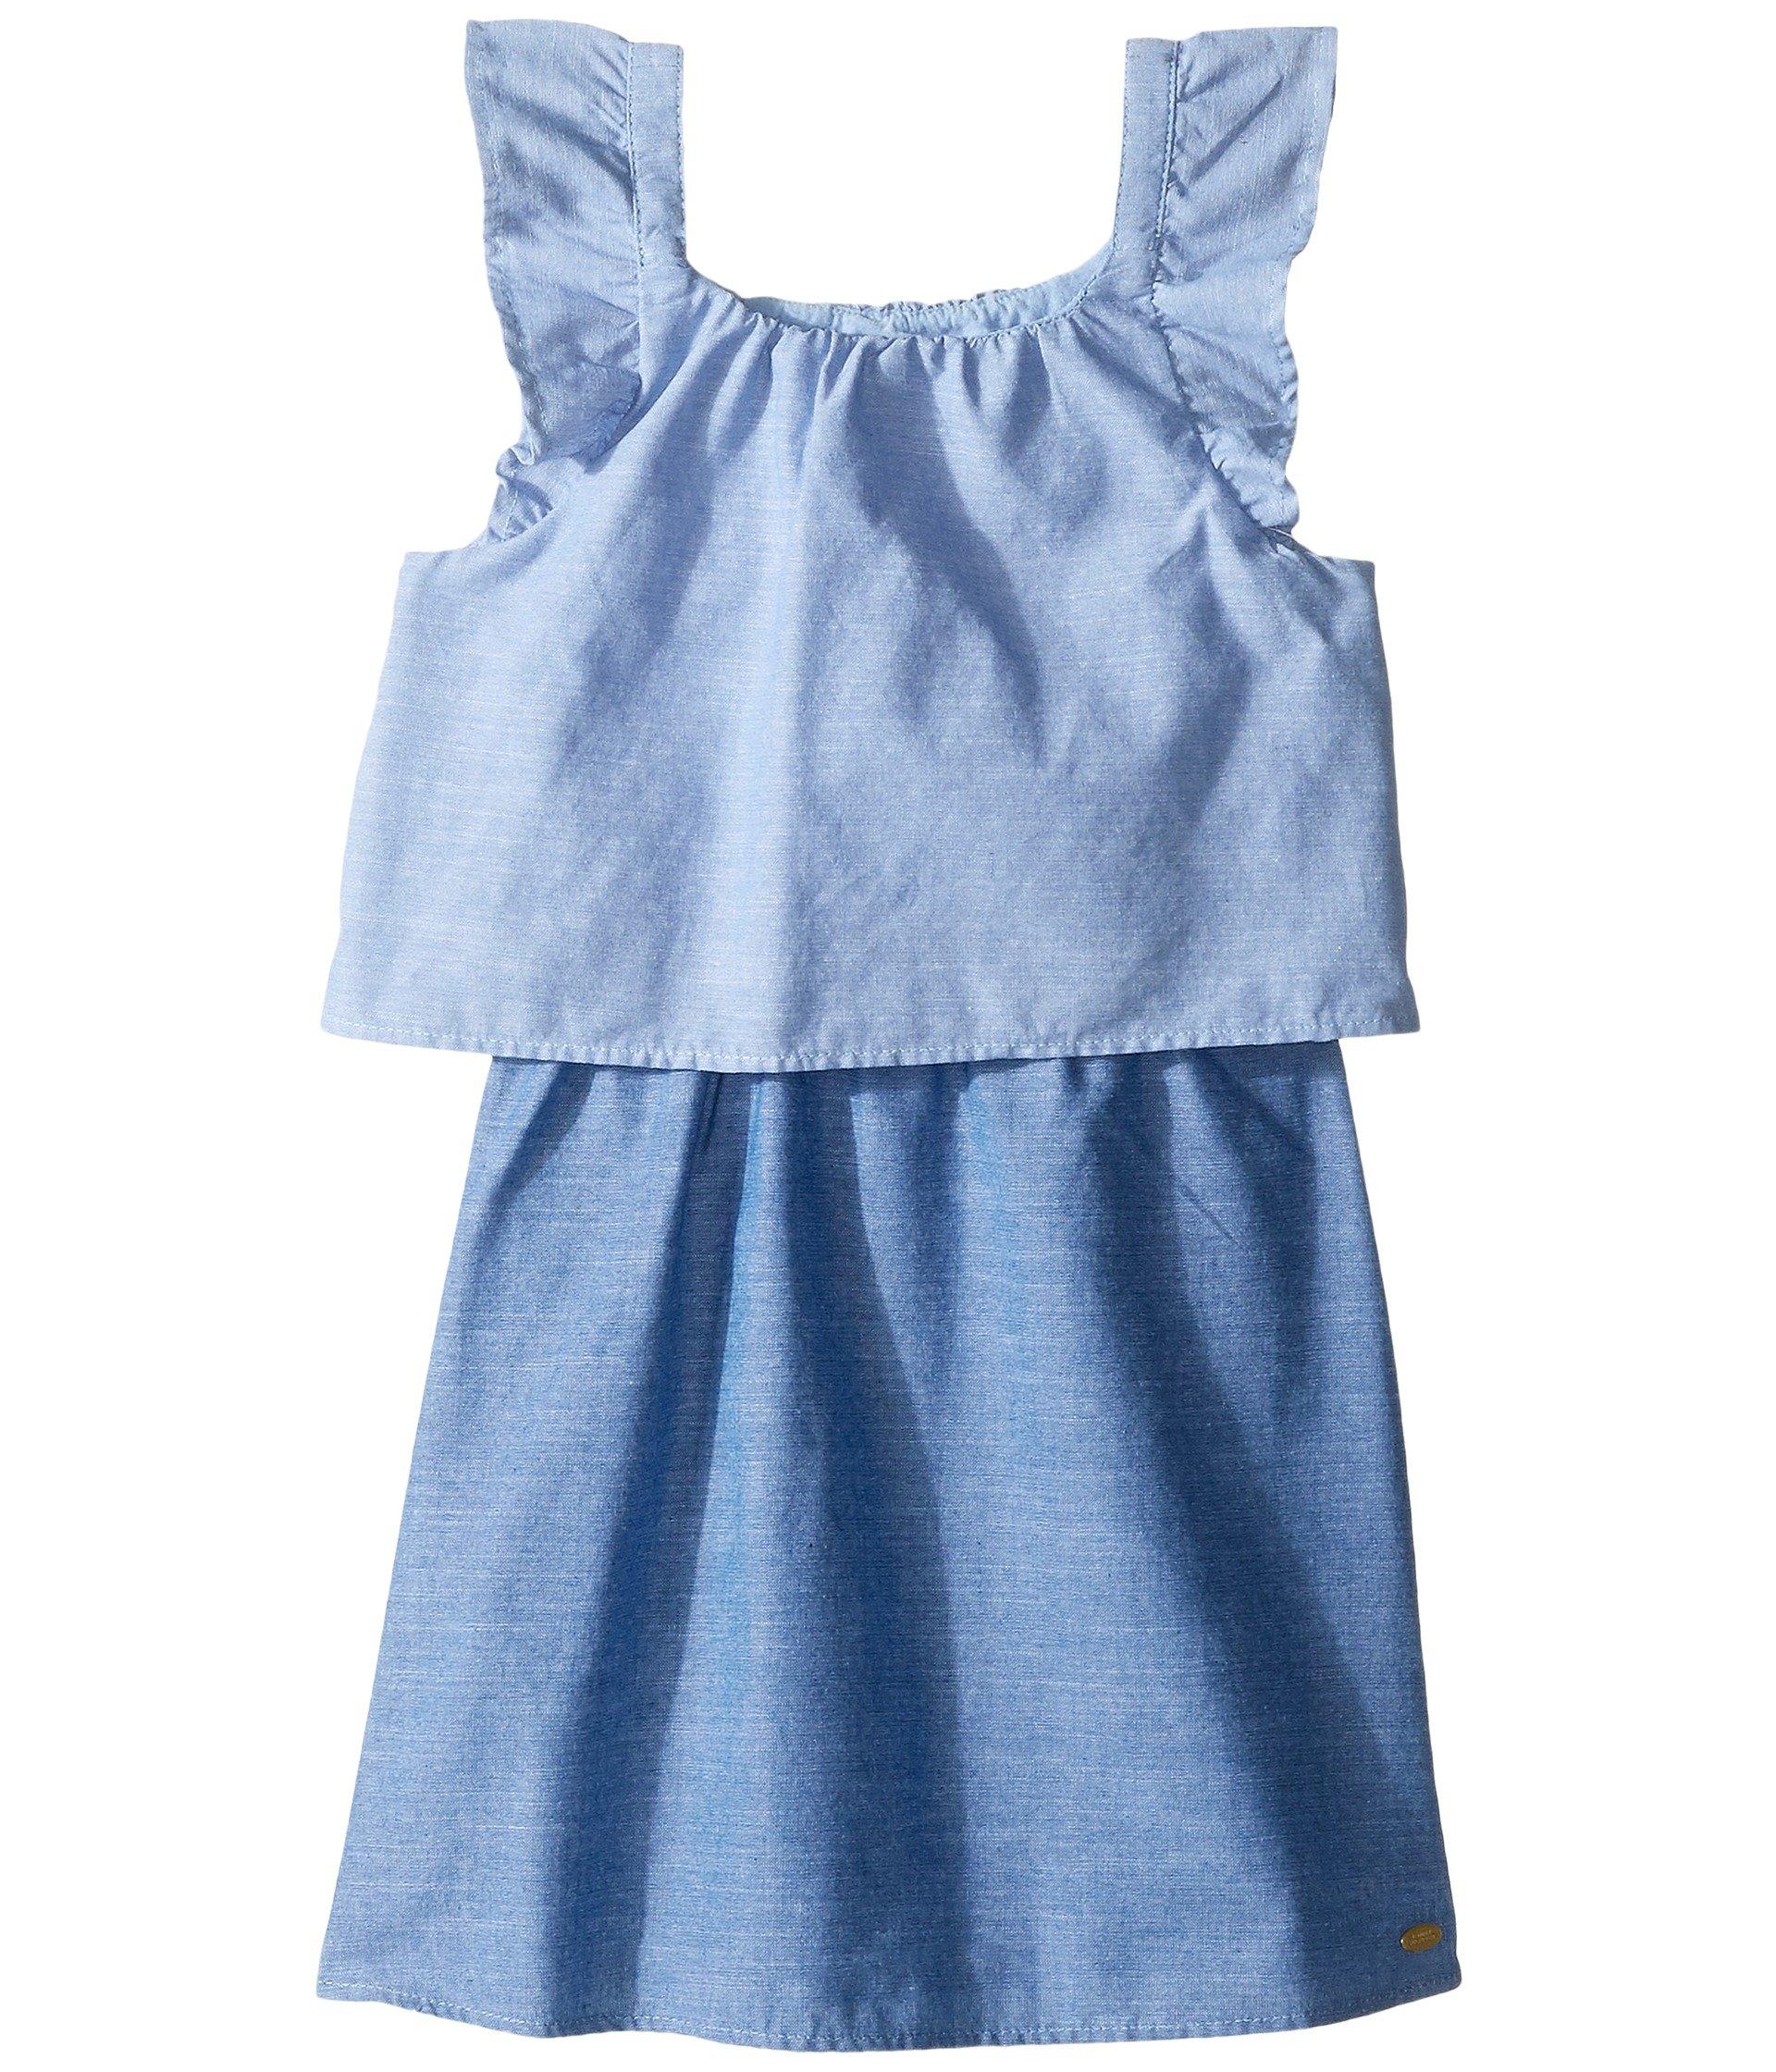 Vestido para Niña Tommy Hilfiger Kids Two-Tone Chambray Top/Skirt Dress (Little Kids)  + Tommy Hilfiger en VeoyCompro.net